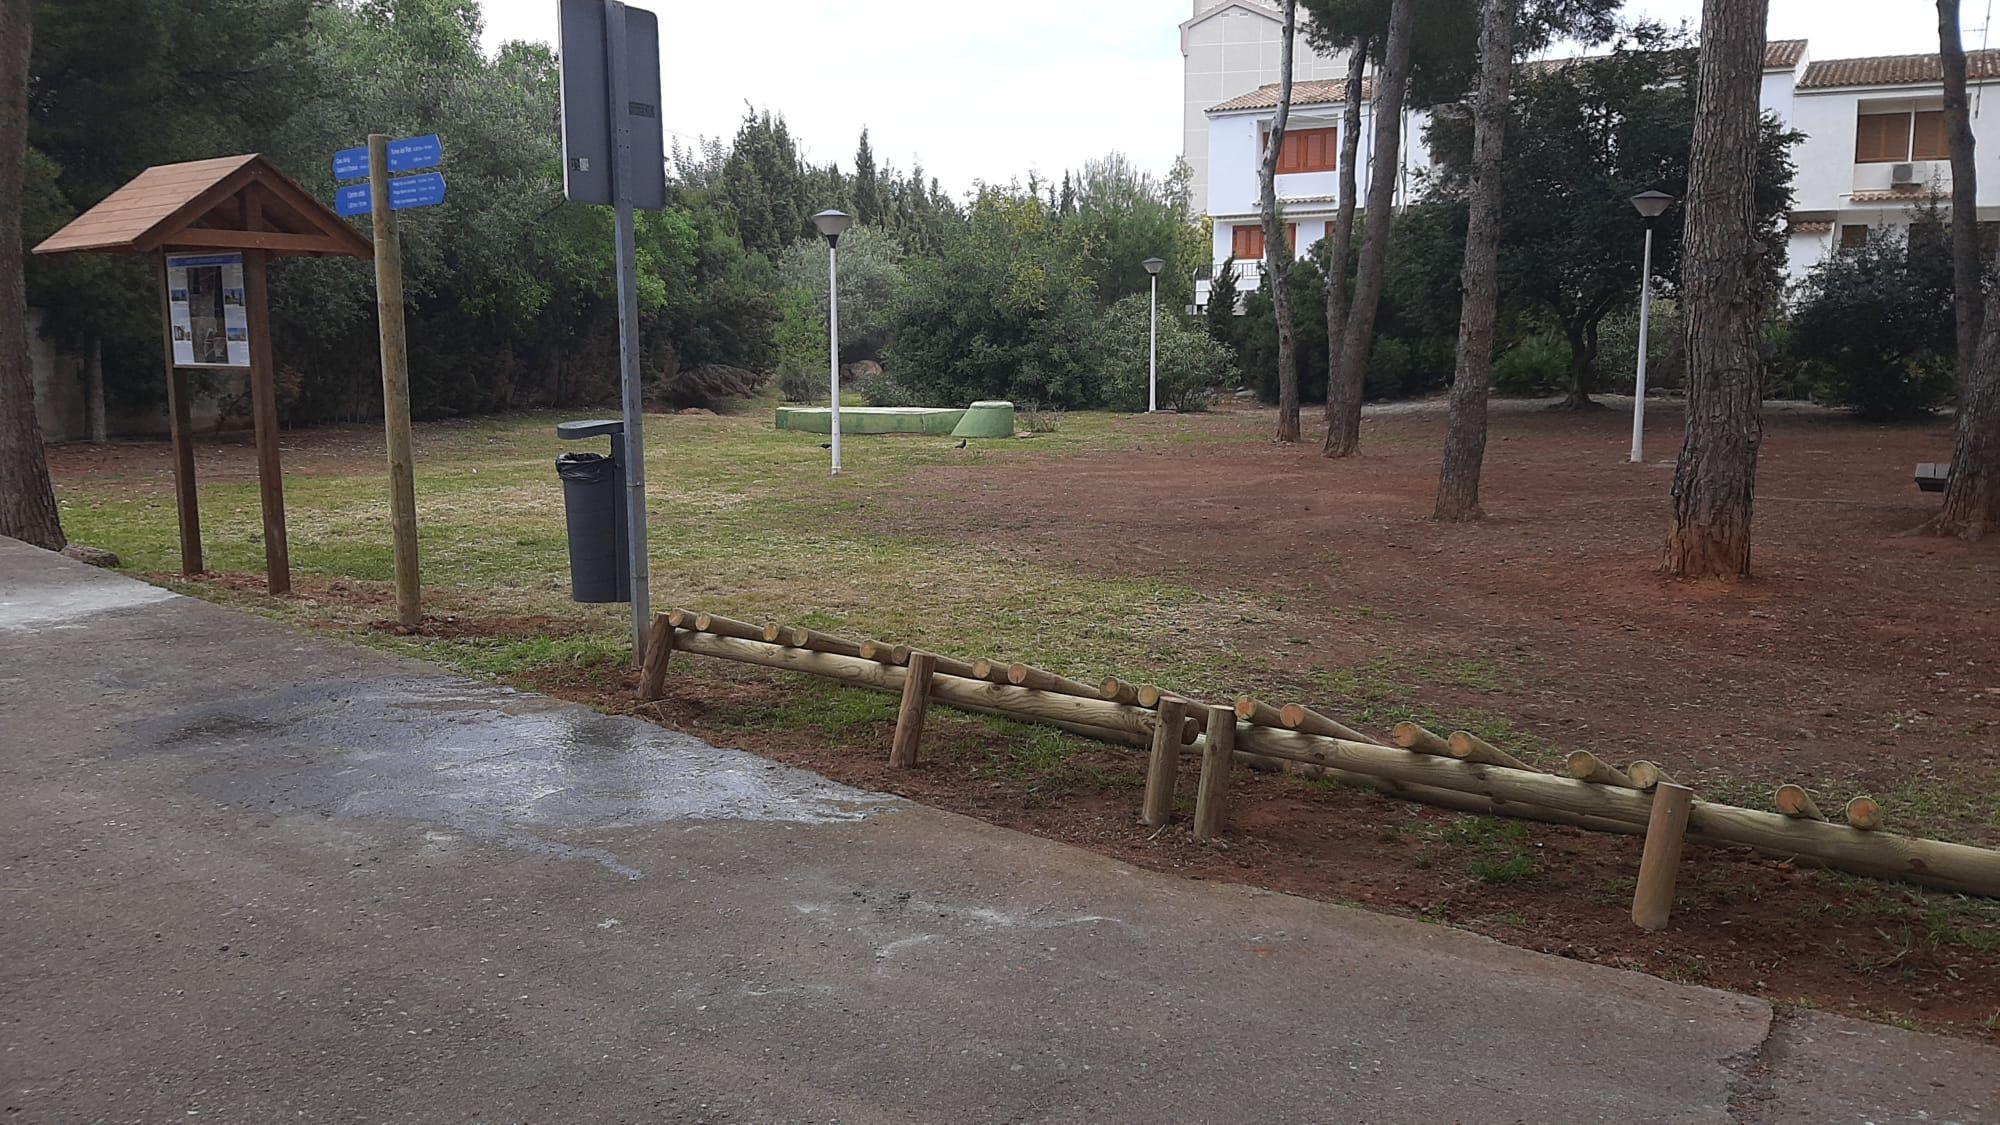 aparcabicis_se�aletica_entrada_via_verde_oropesa (2).jpeg